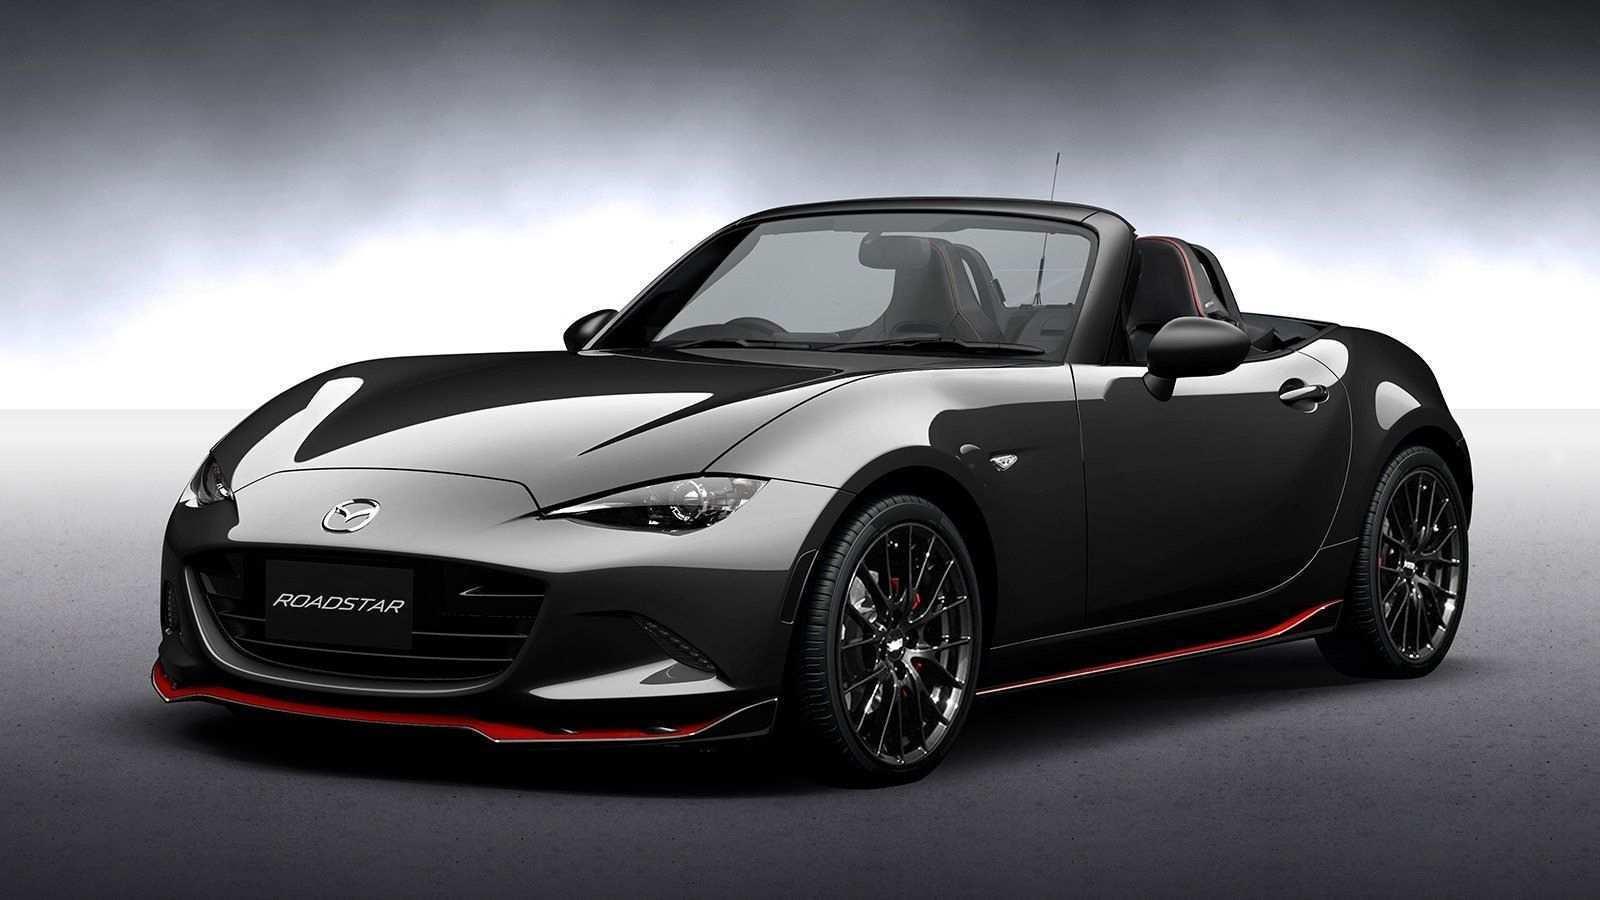 45 All New 2020 Mazda Mx 5 Miata Spesification by 2020 Mazda Mx 5 Miata